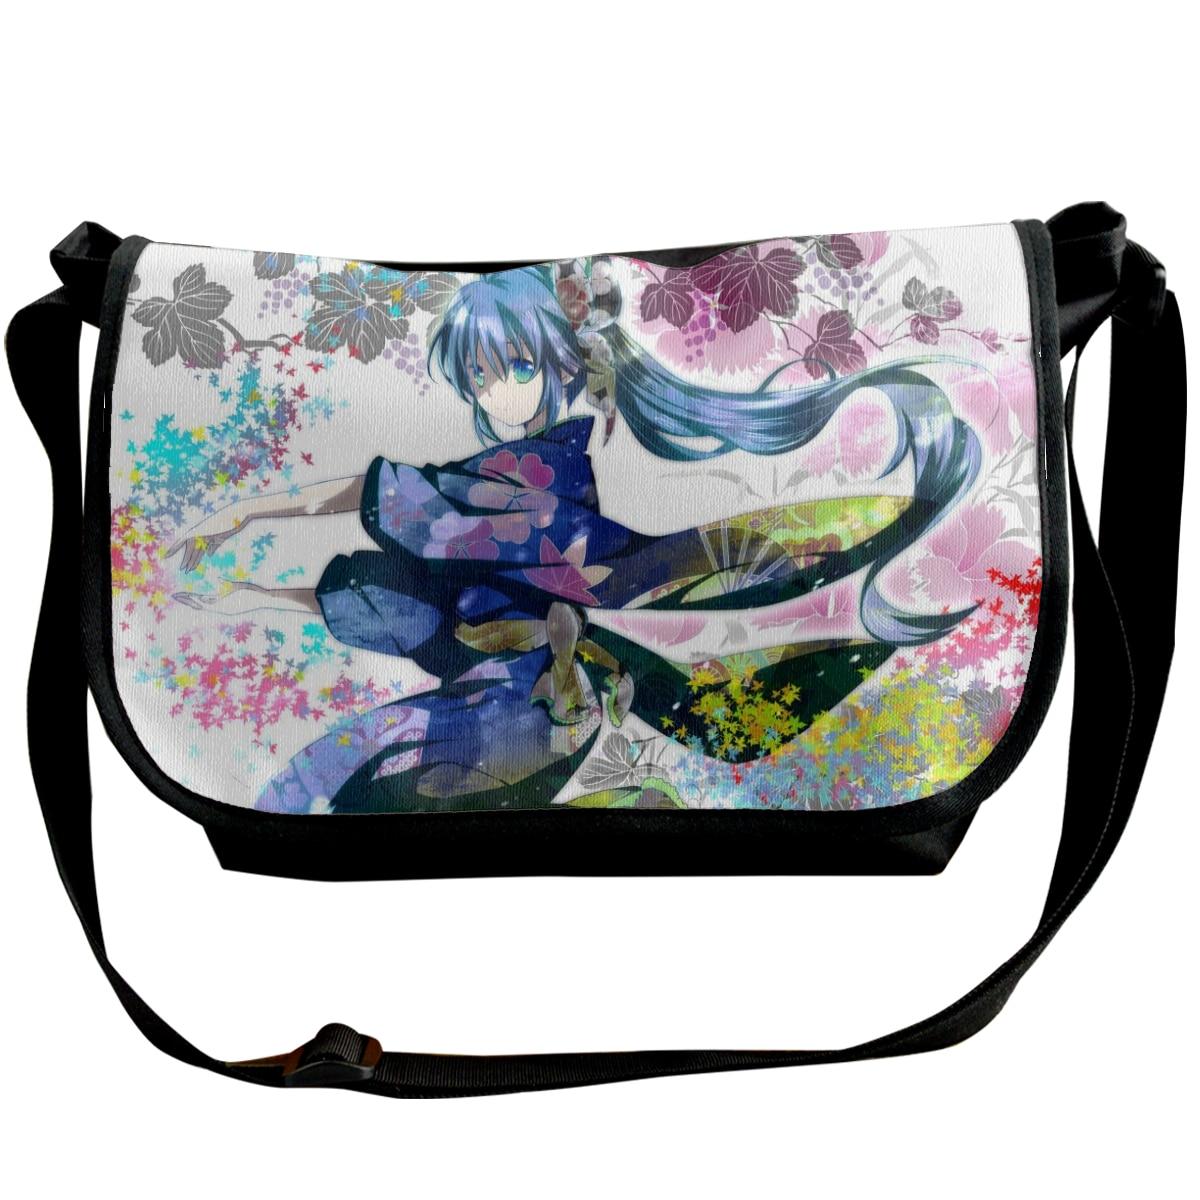 Hefu-008 Fashion Solid Canvas Messenger Satchel Bags Buckle Casual Portable Shoulder Bag